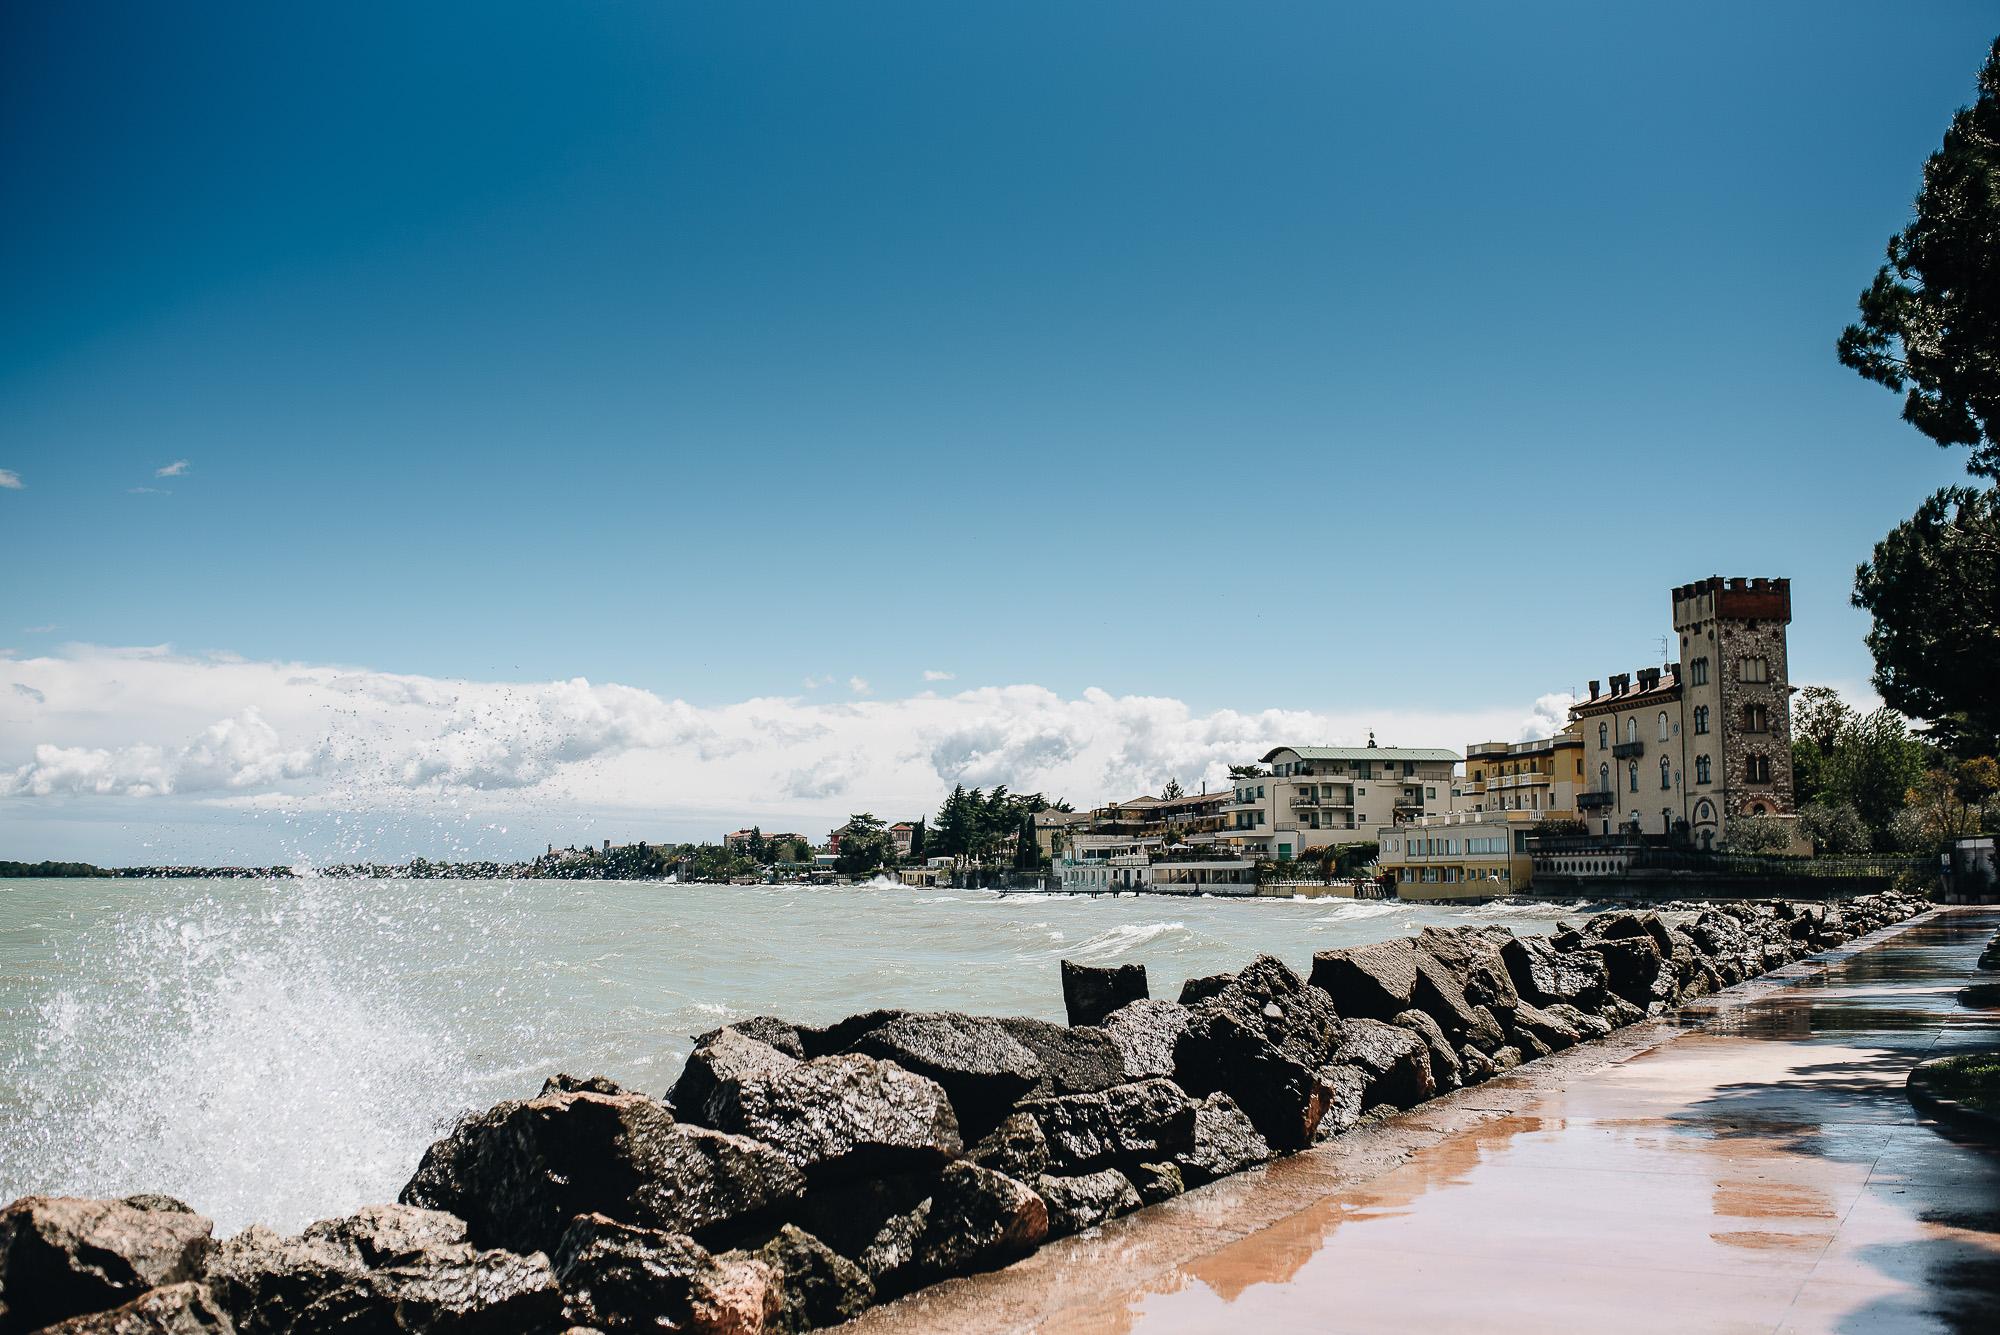 OurBeautifulAdventure-LakeGarda-Italy-Blog-1417.jpg